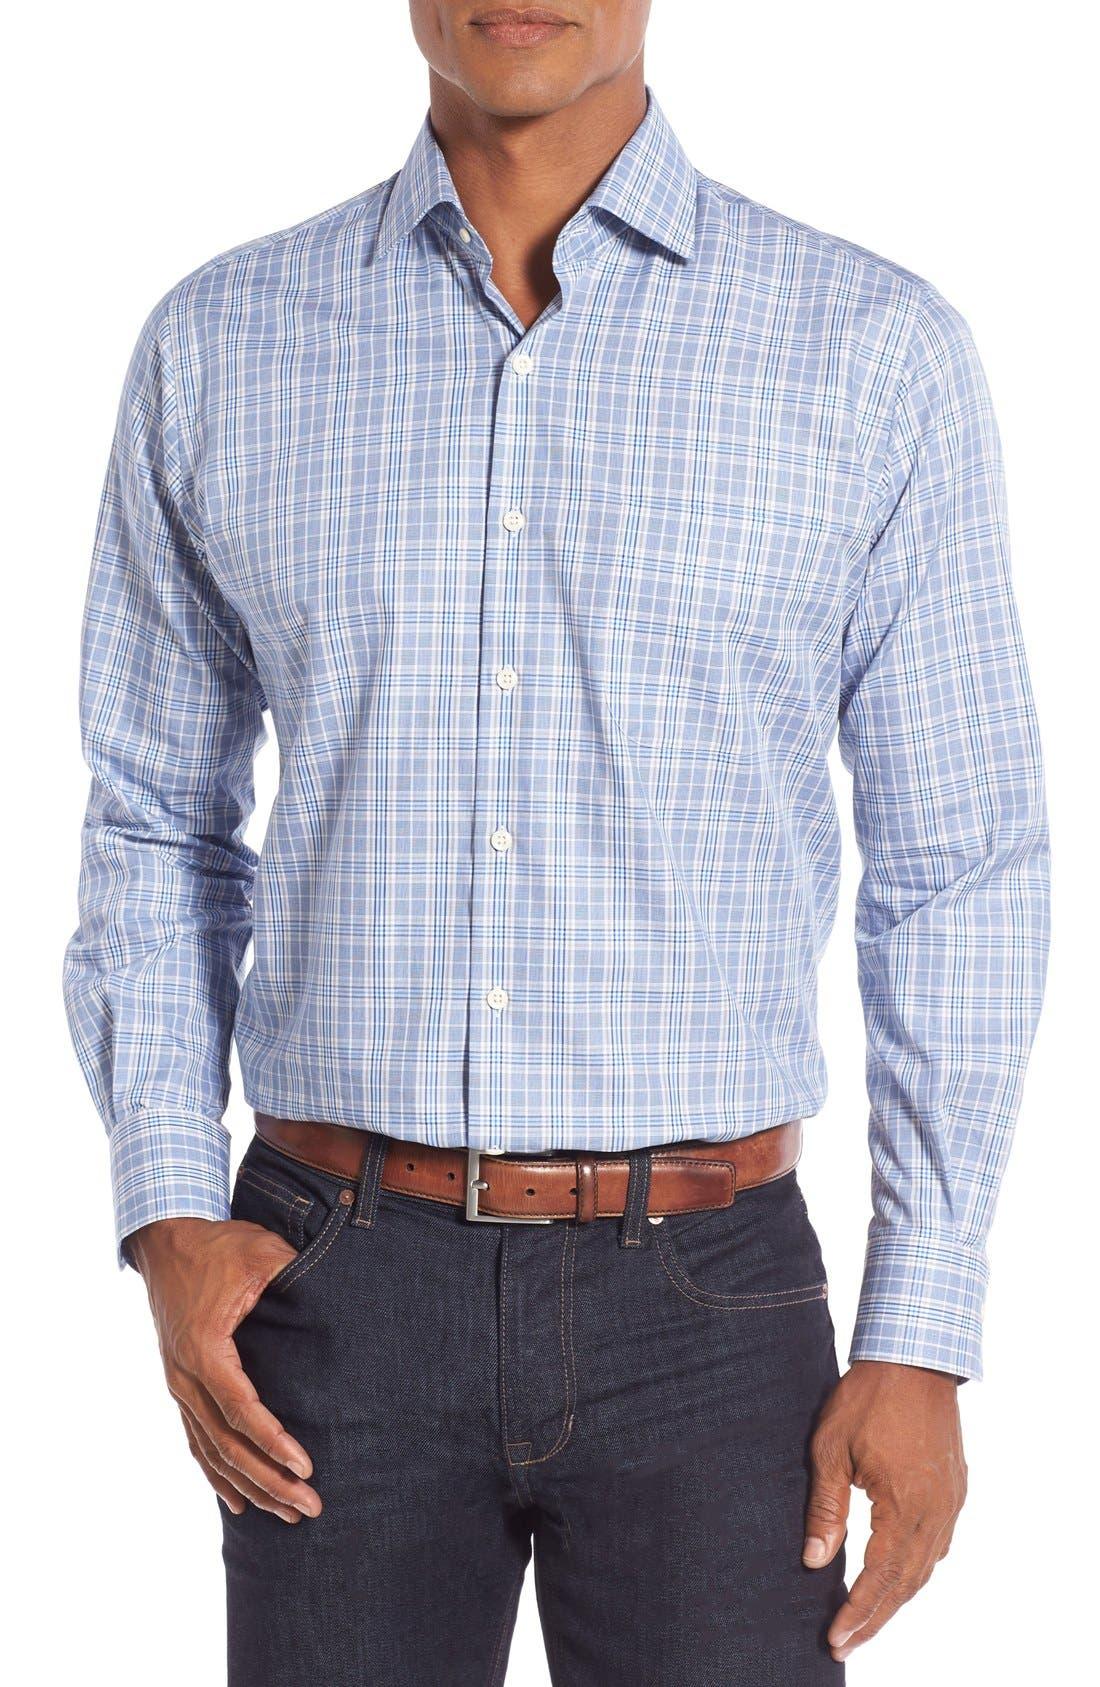 Alternate Image 1 Selected - Peter Millar Regular Fit Glen Plaid Sport Shirt